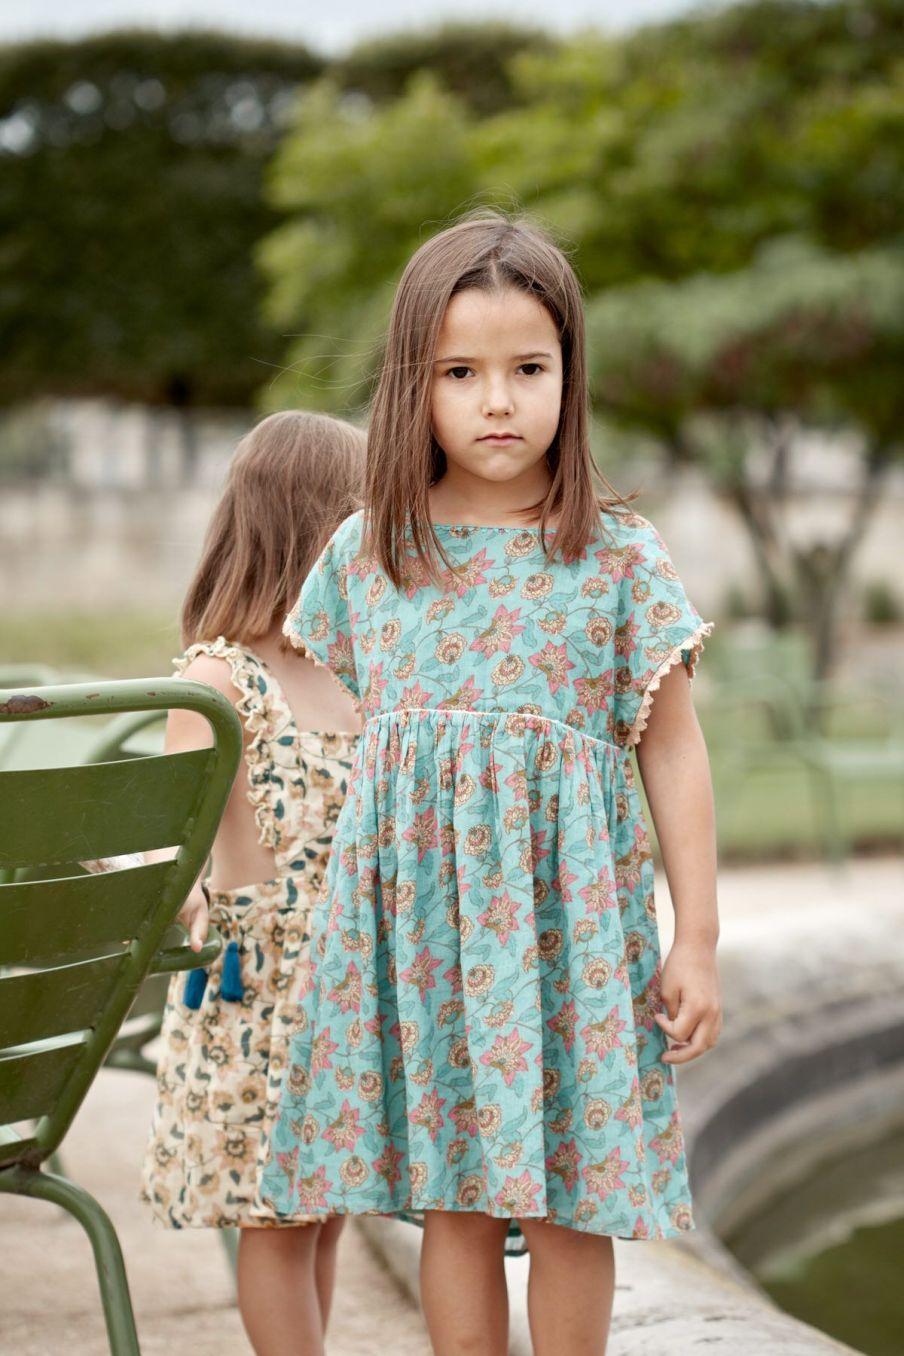 boheme chic vintage robe fille tapalpa turquoise flowers